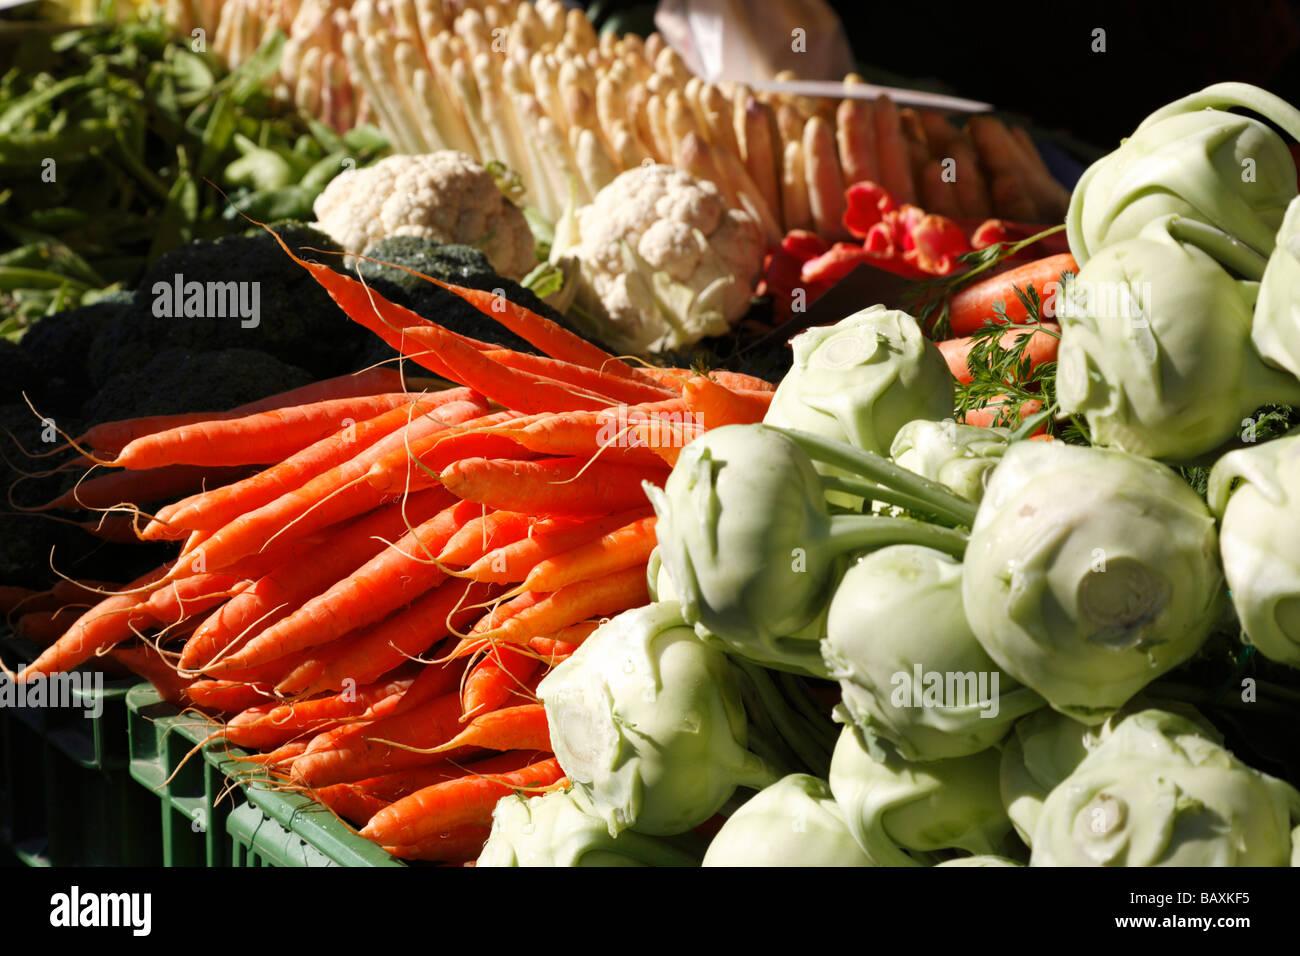 Fresh vegetables at the market, Marktplatz, Basel, Switzerland - Stock Image